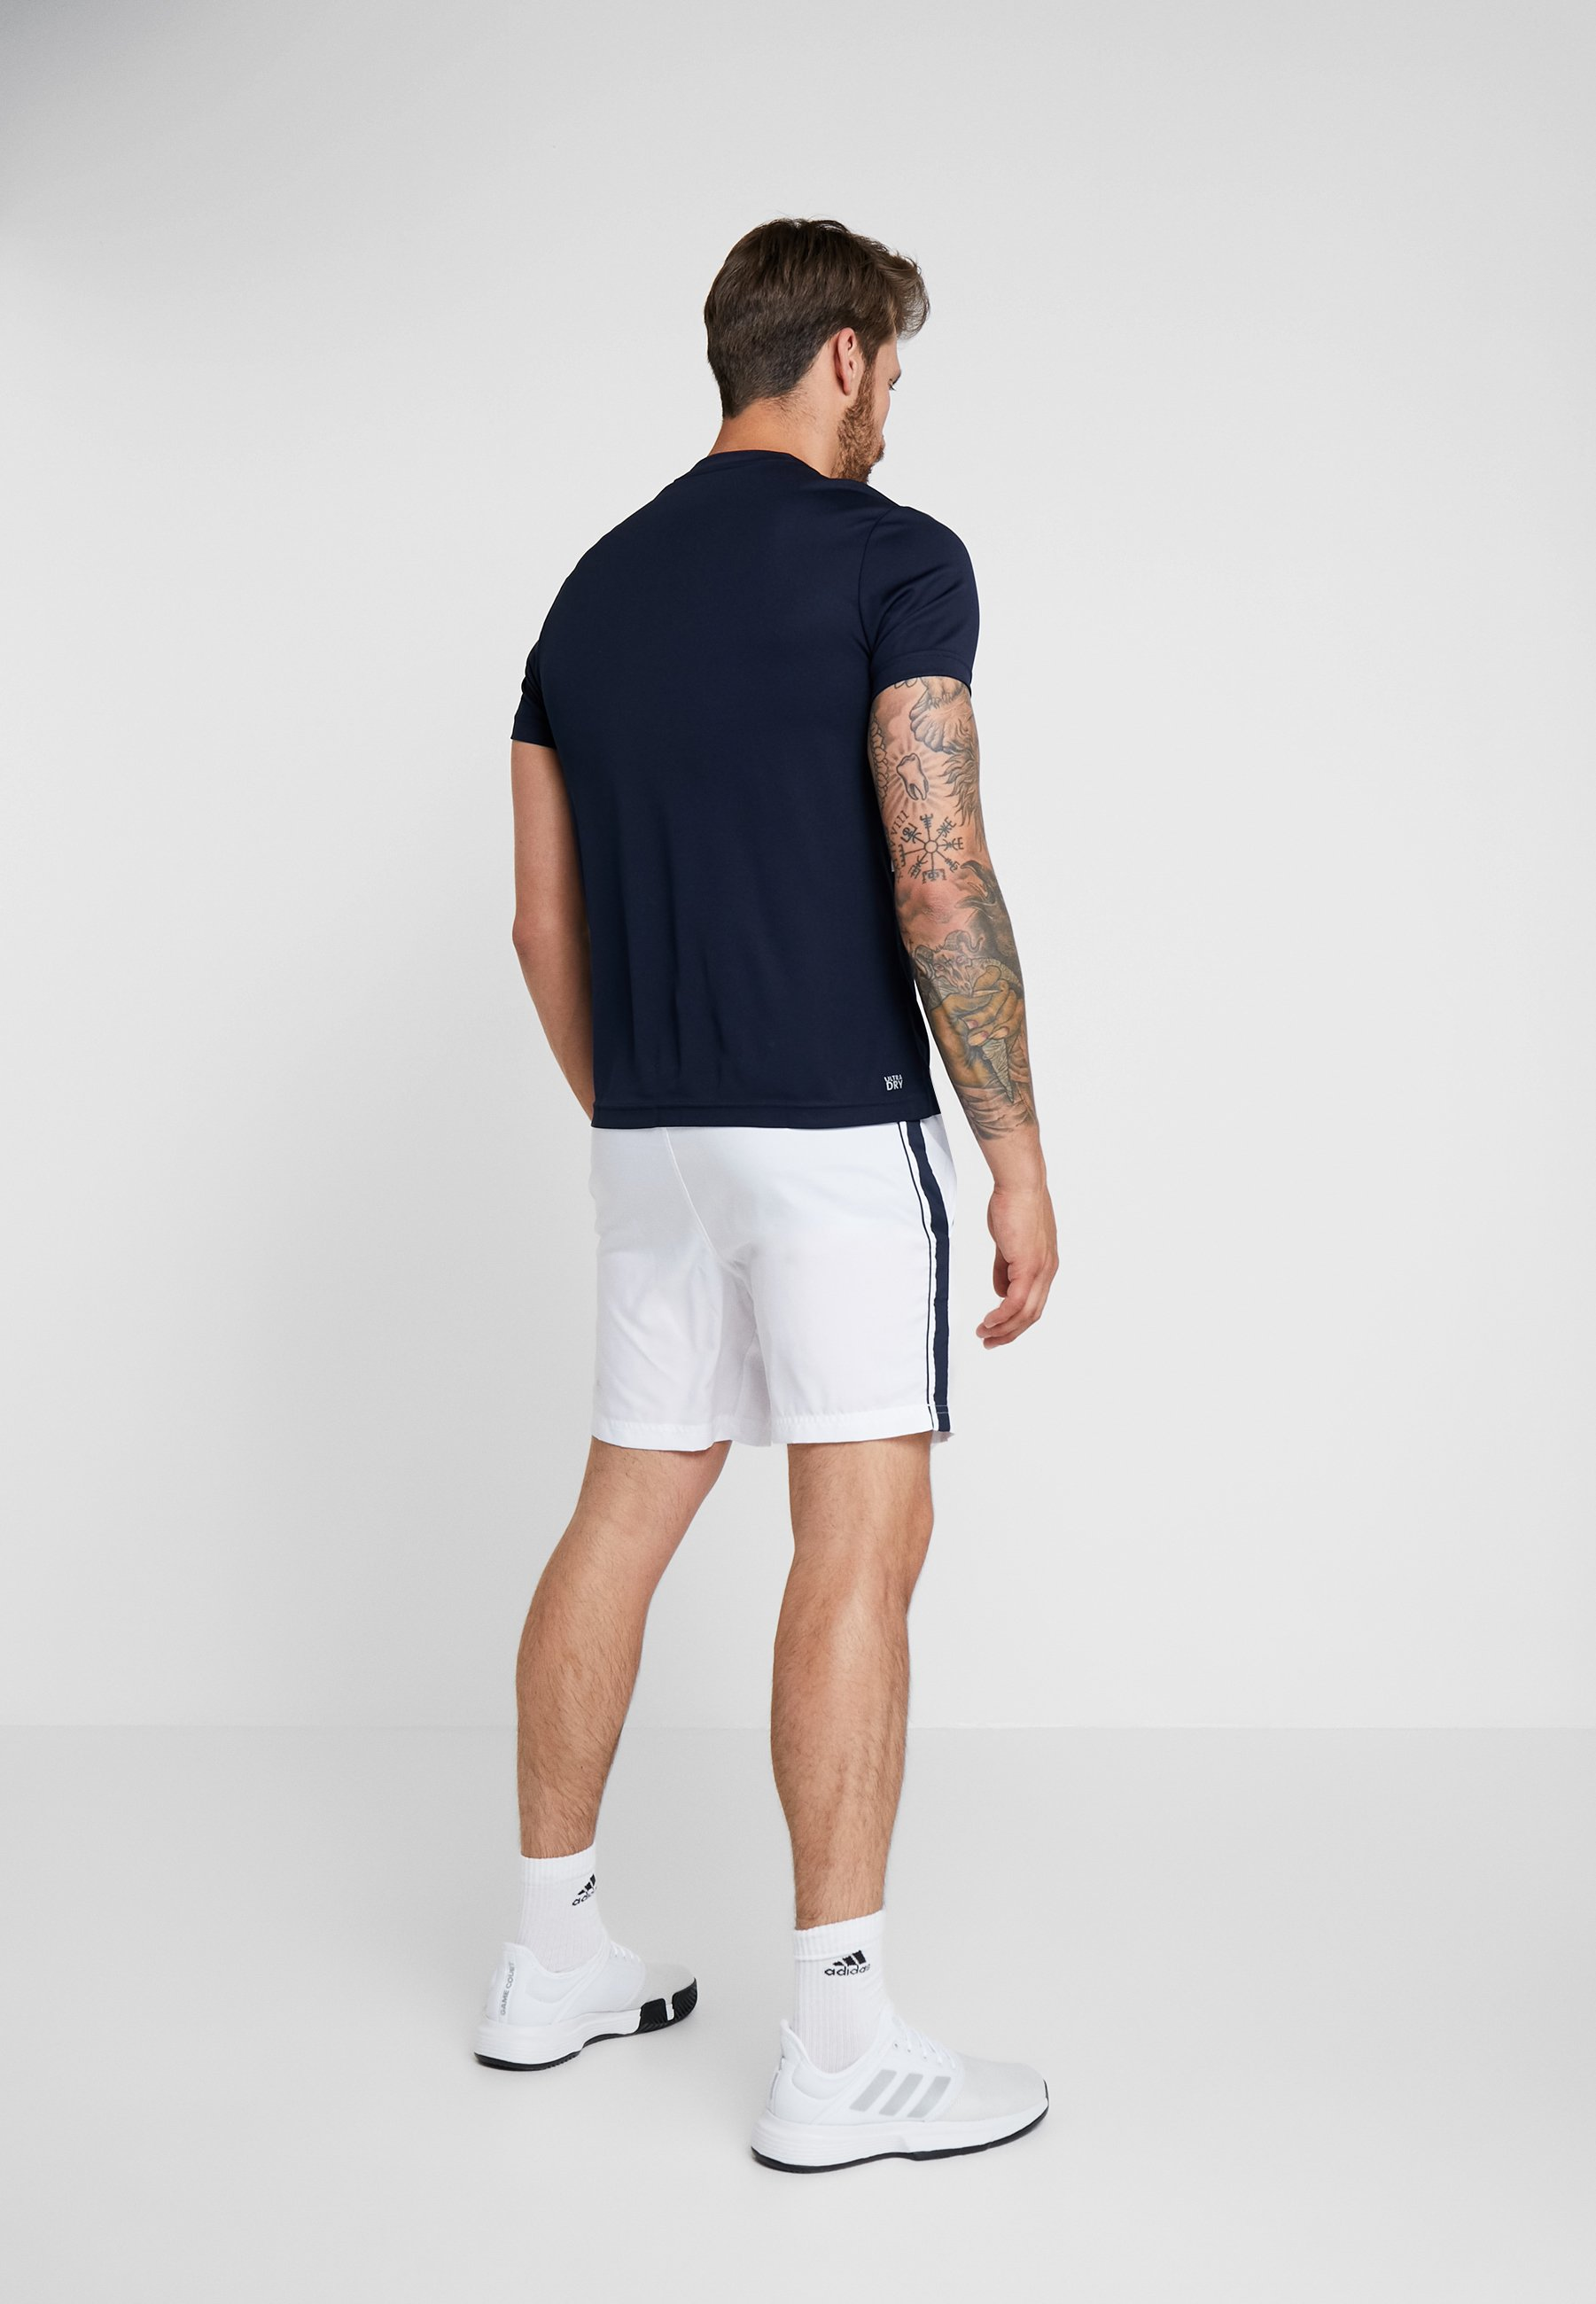 ocean Sport white Lacoste TennisT Imprimé Blue Navy shirt Nvmnw08